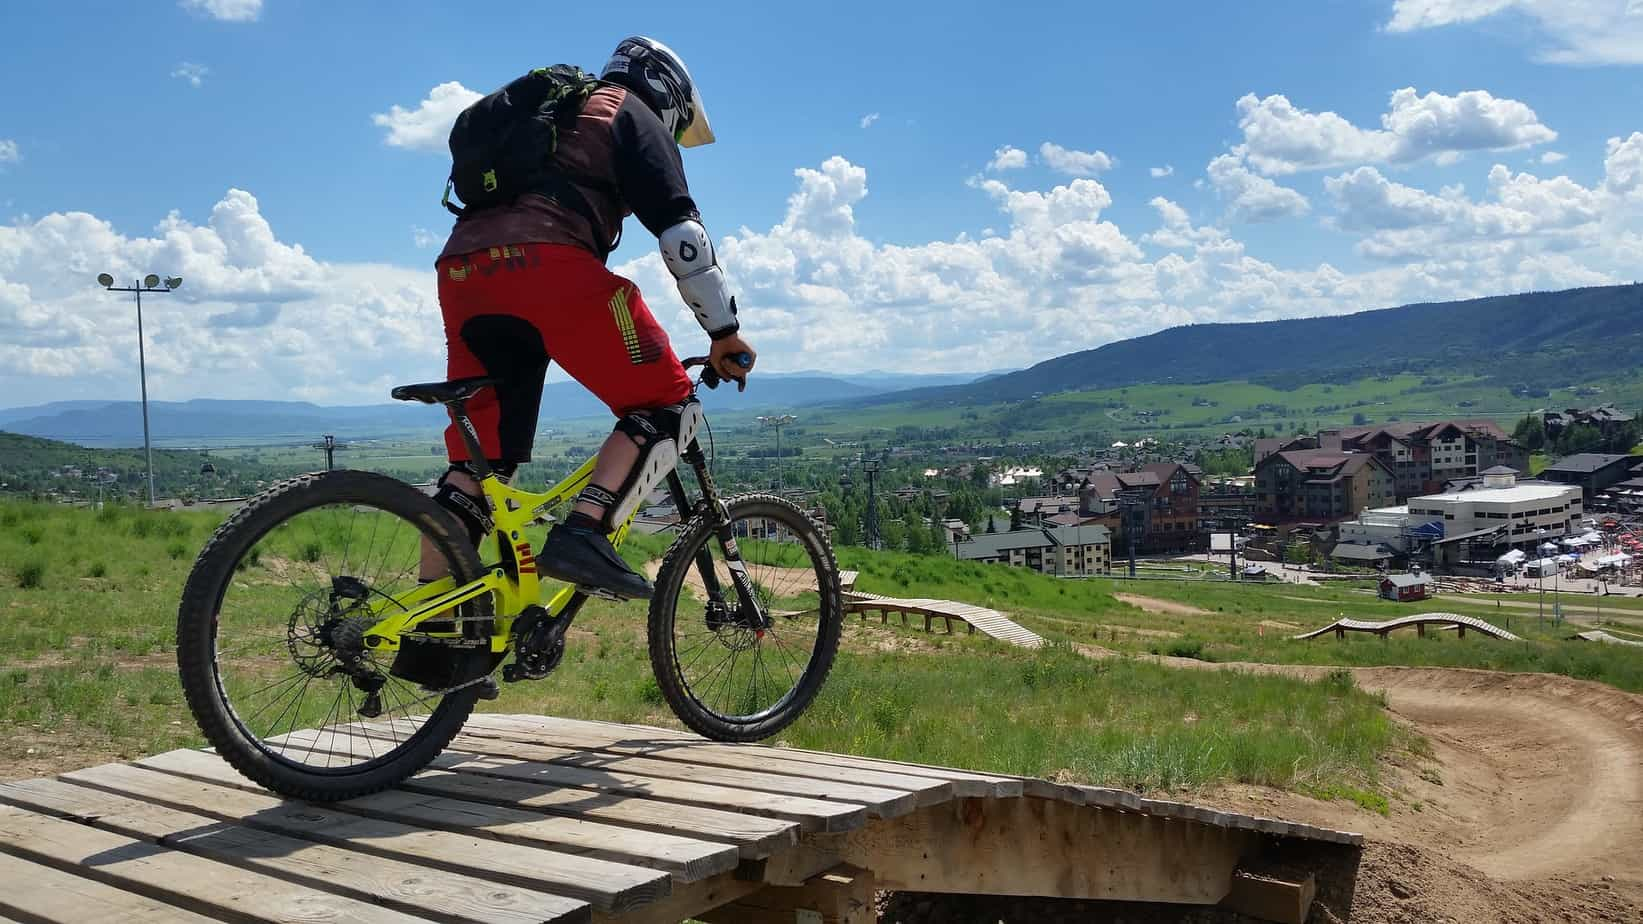 buying a mountain bike for beginners